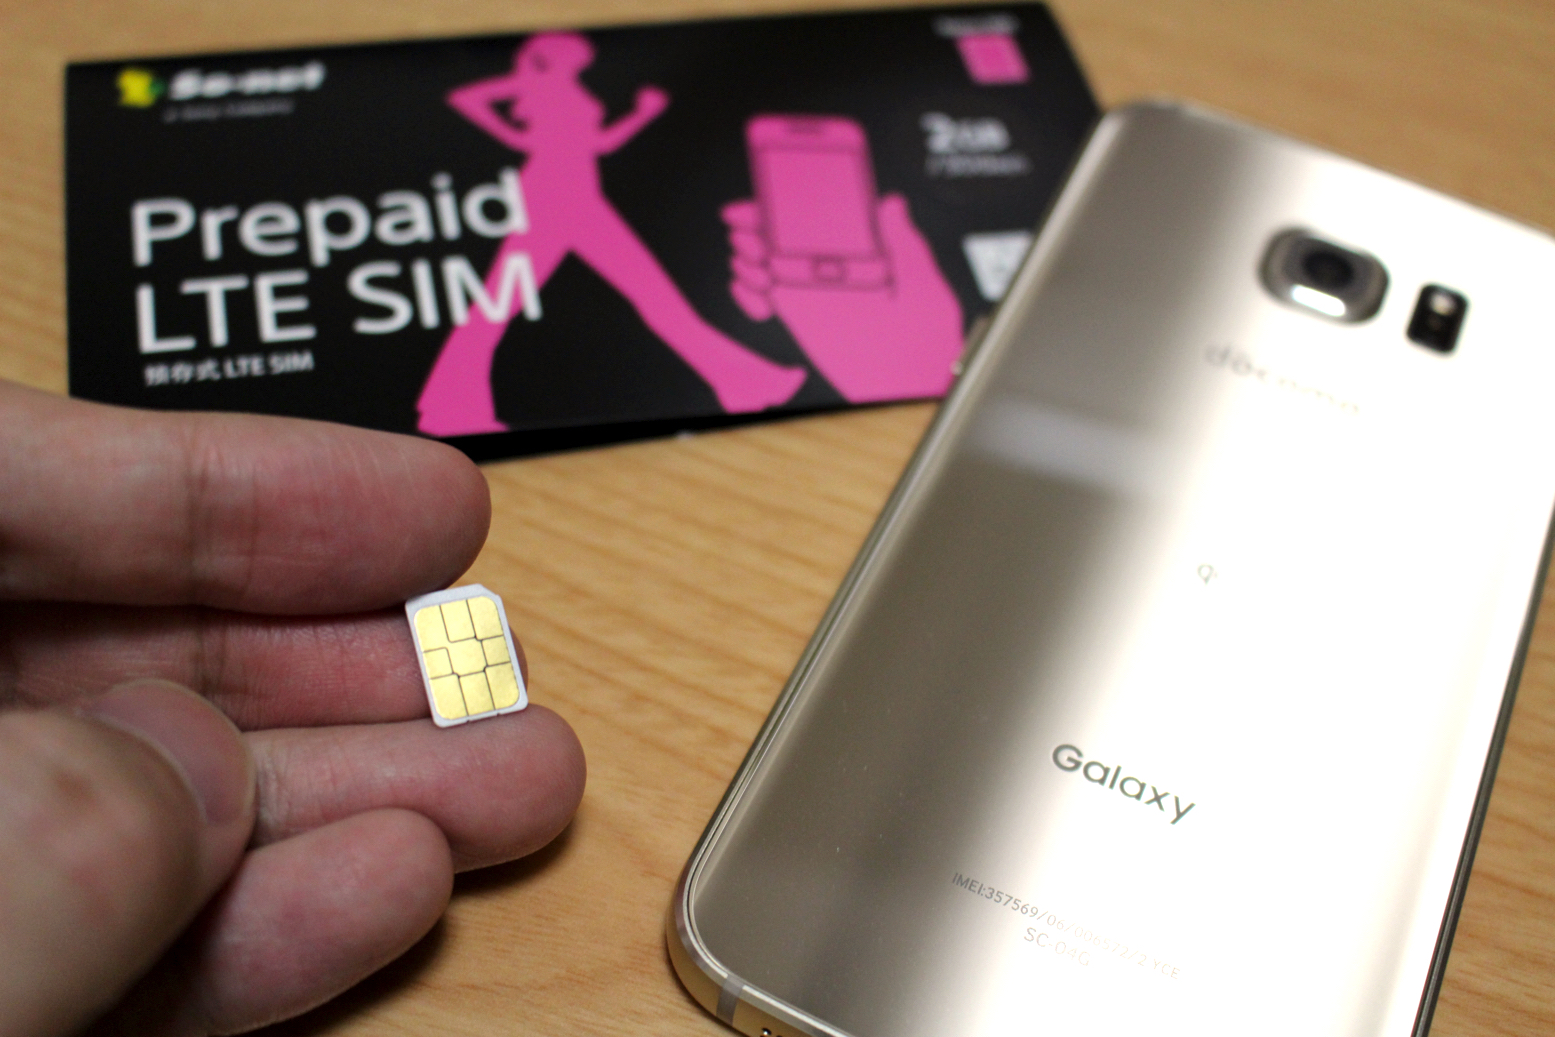 Galaxy S6 edgeにSo-netのプリペイドSIM『Prepaid LTE SIM』を入れてみた